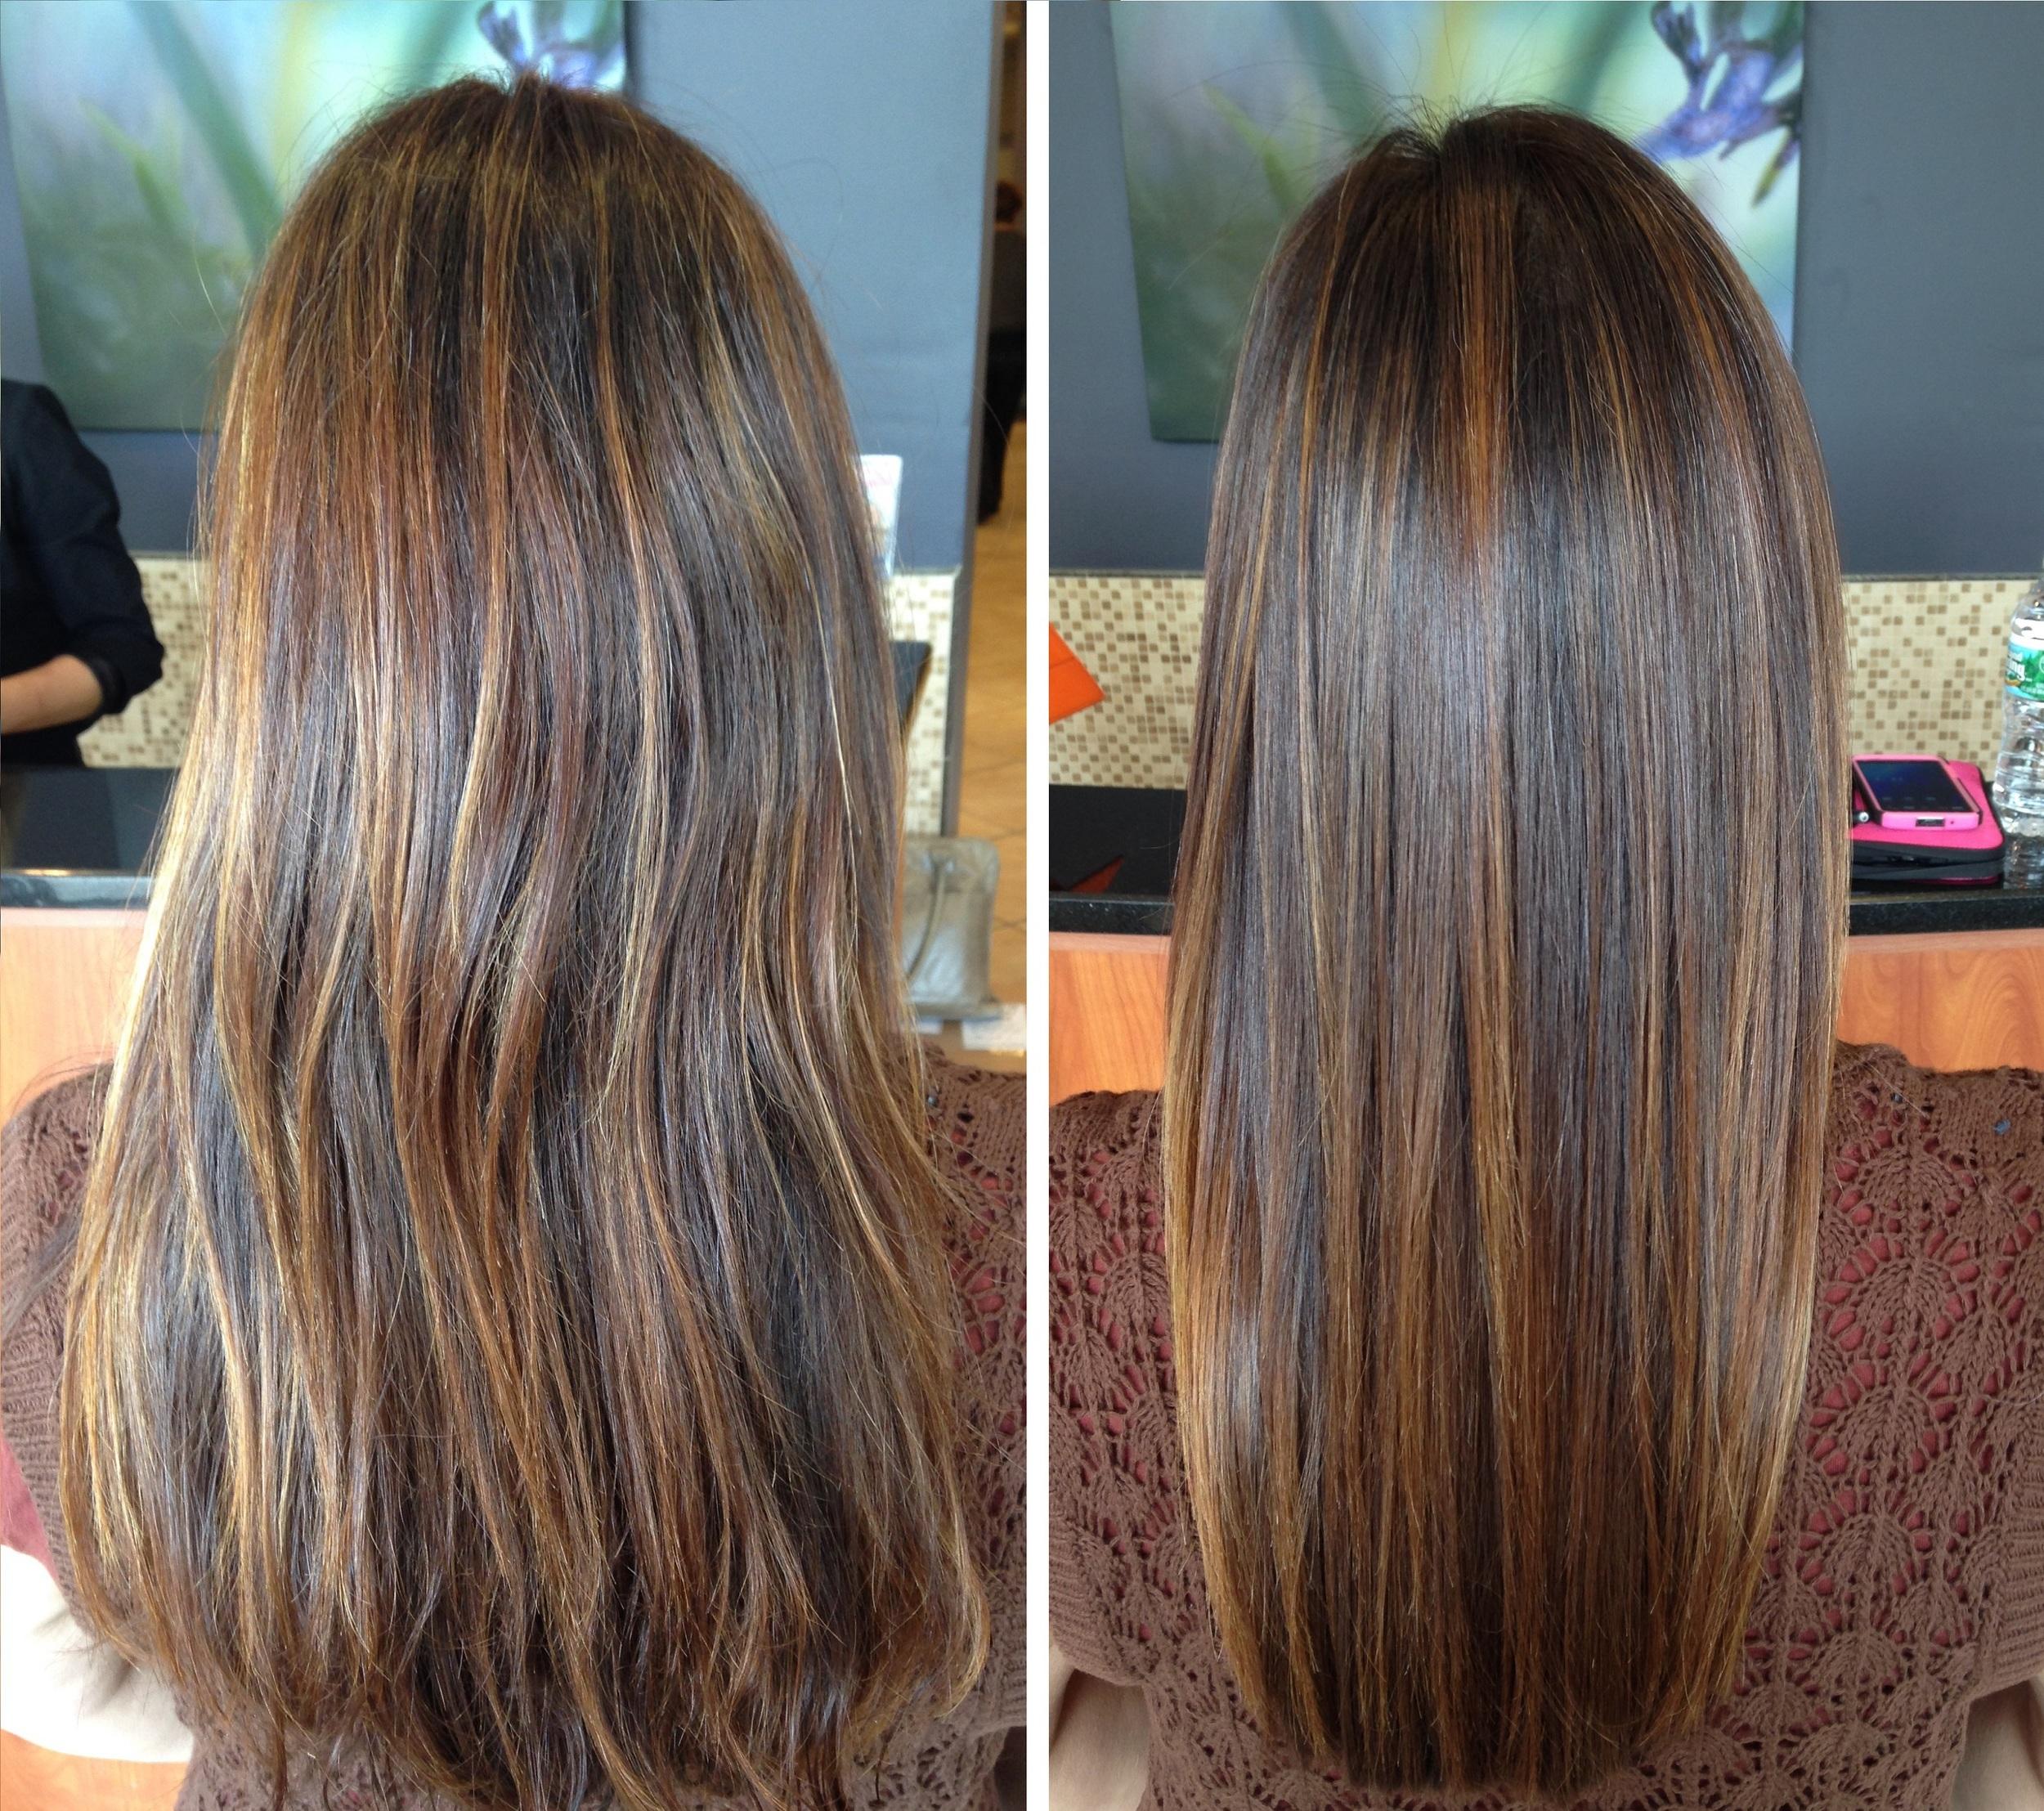 Hair extensions keratins salon belladonna before after keratin treatment pmusecretfo Images